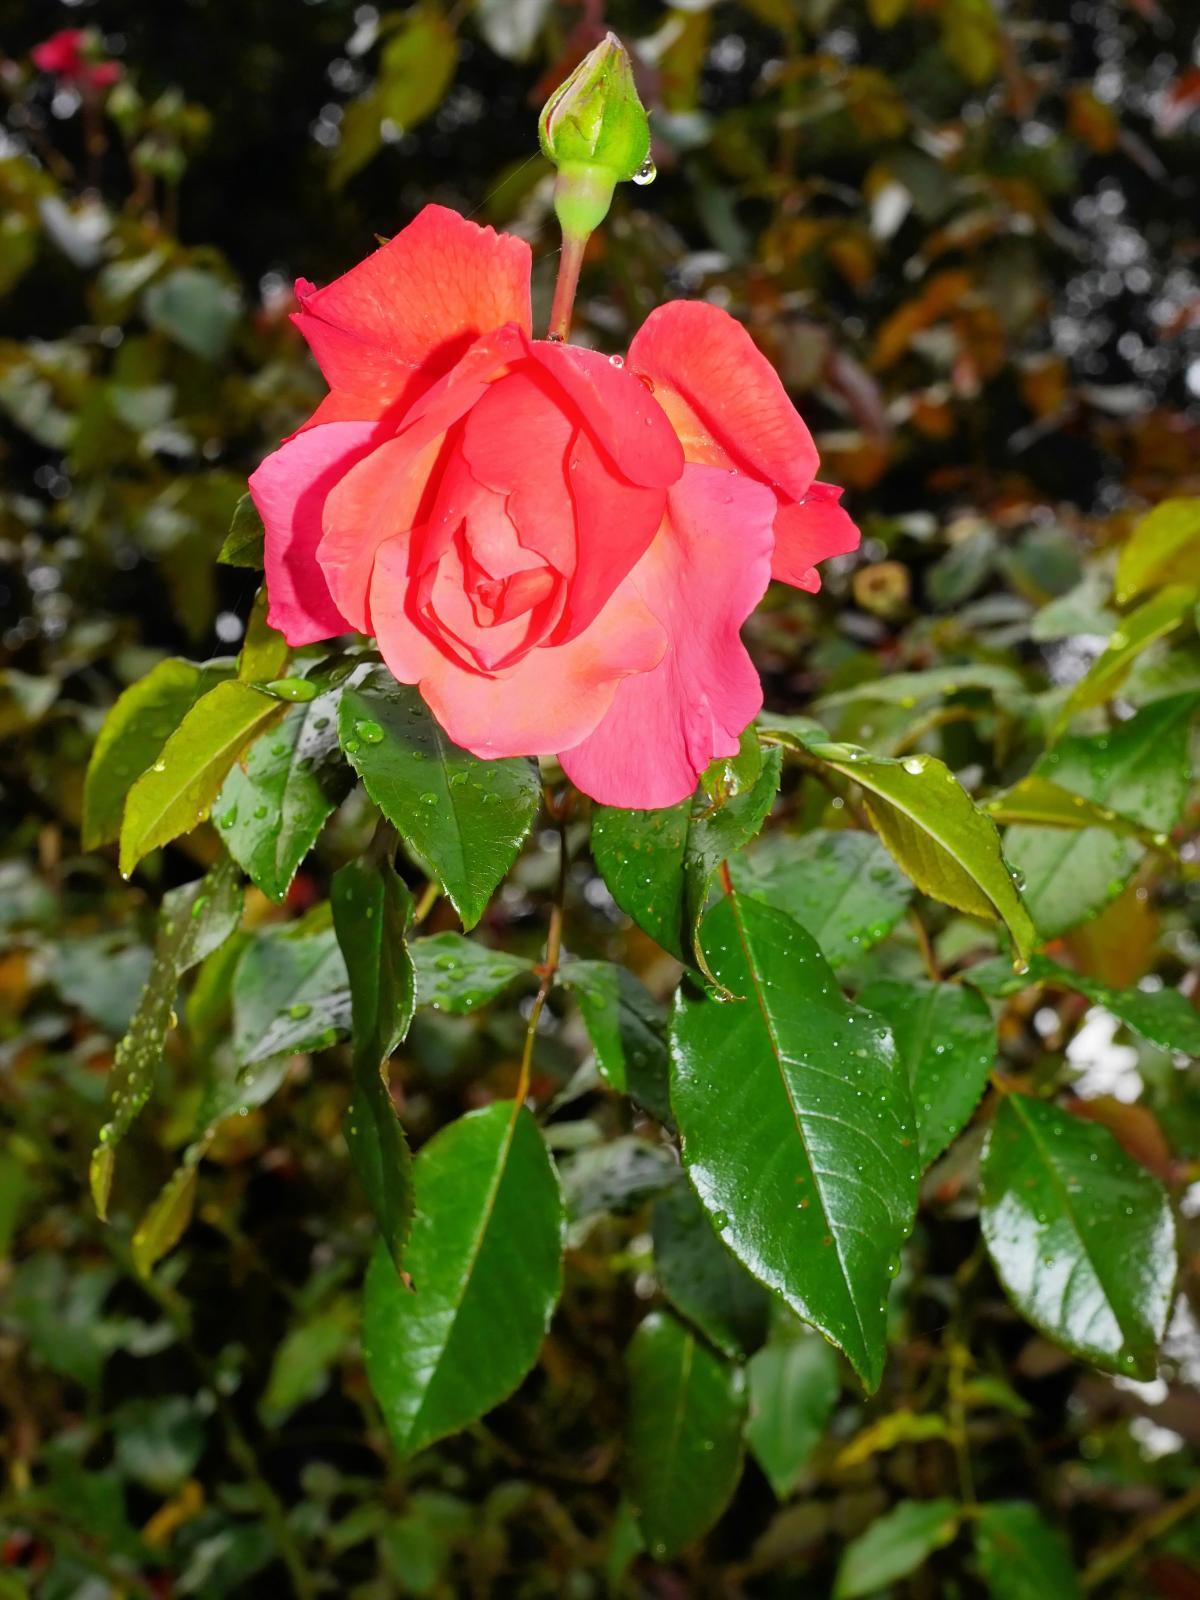 Bloom blossom close filigree